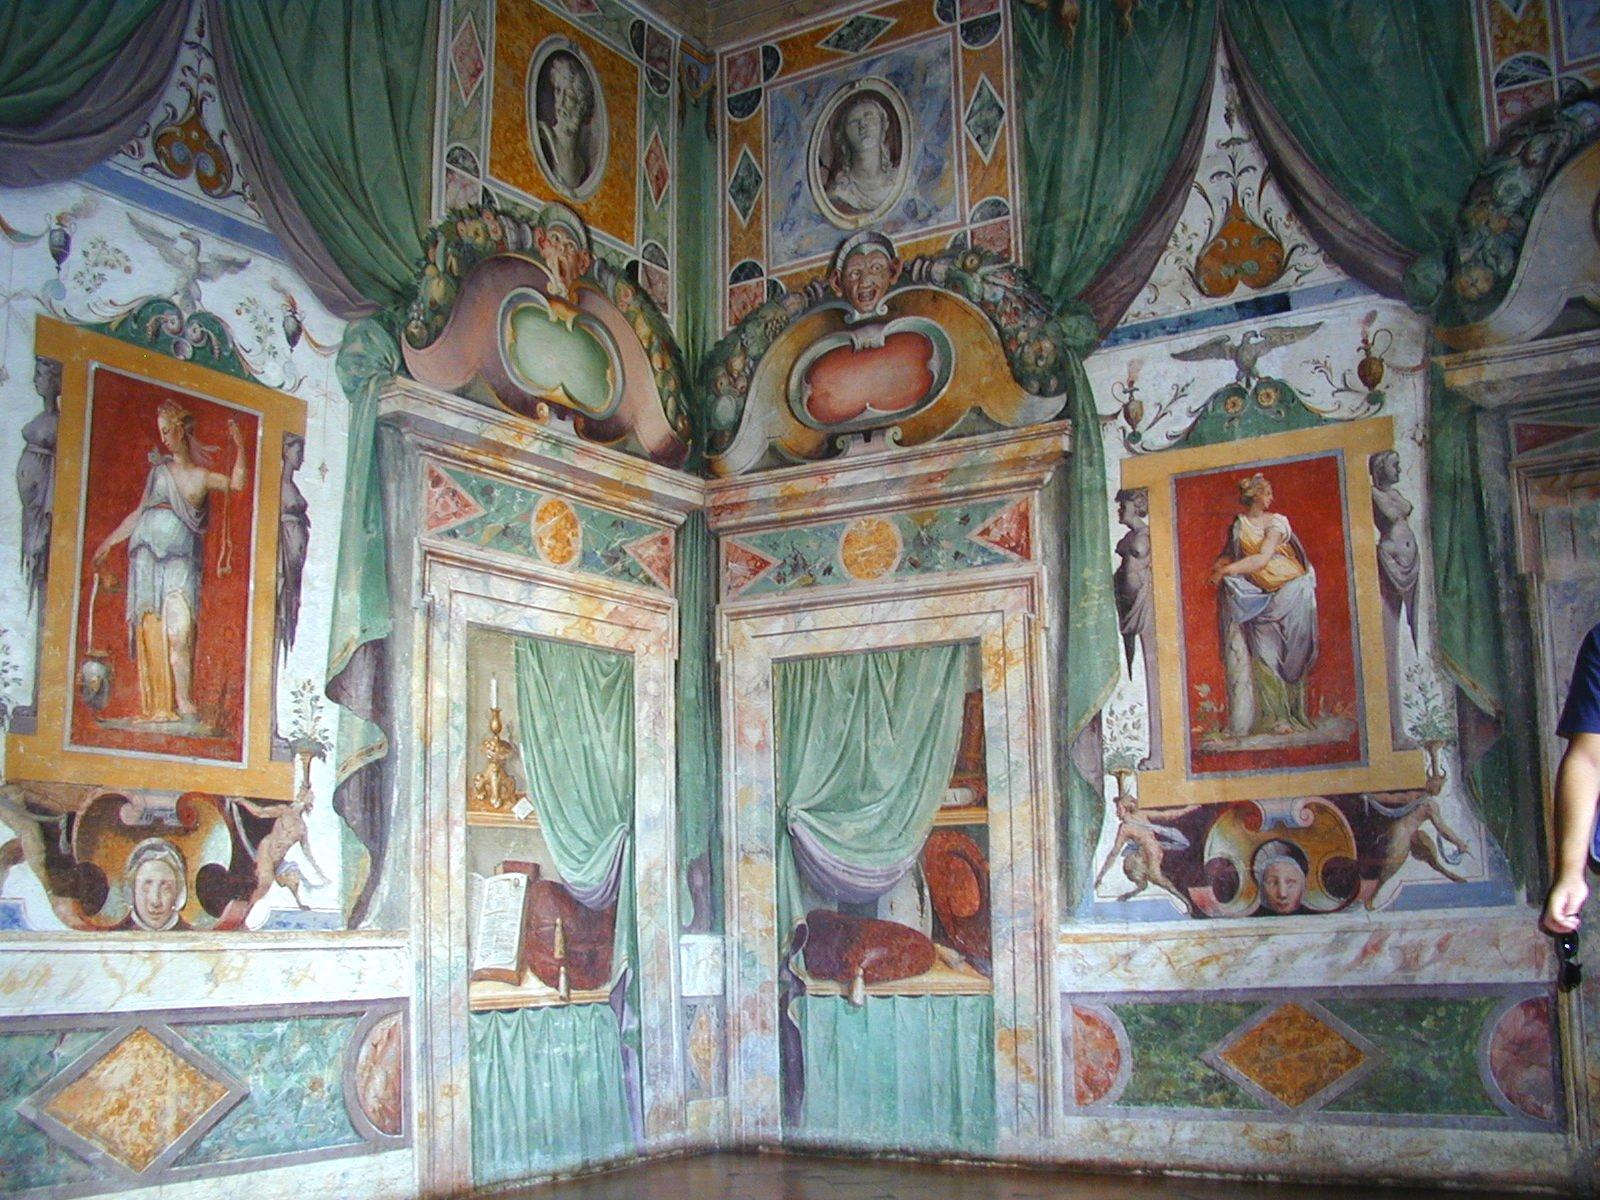 Renaissance frescoes inside the Villa d'Este, Tivoli, Rome